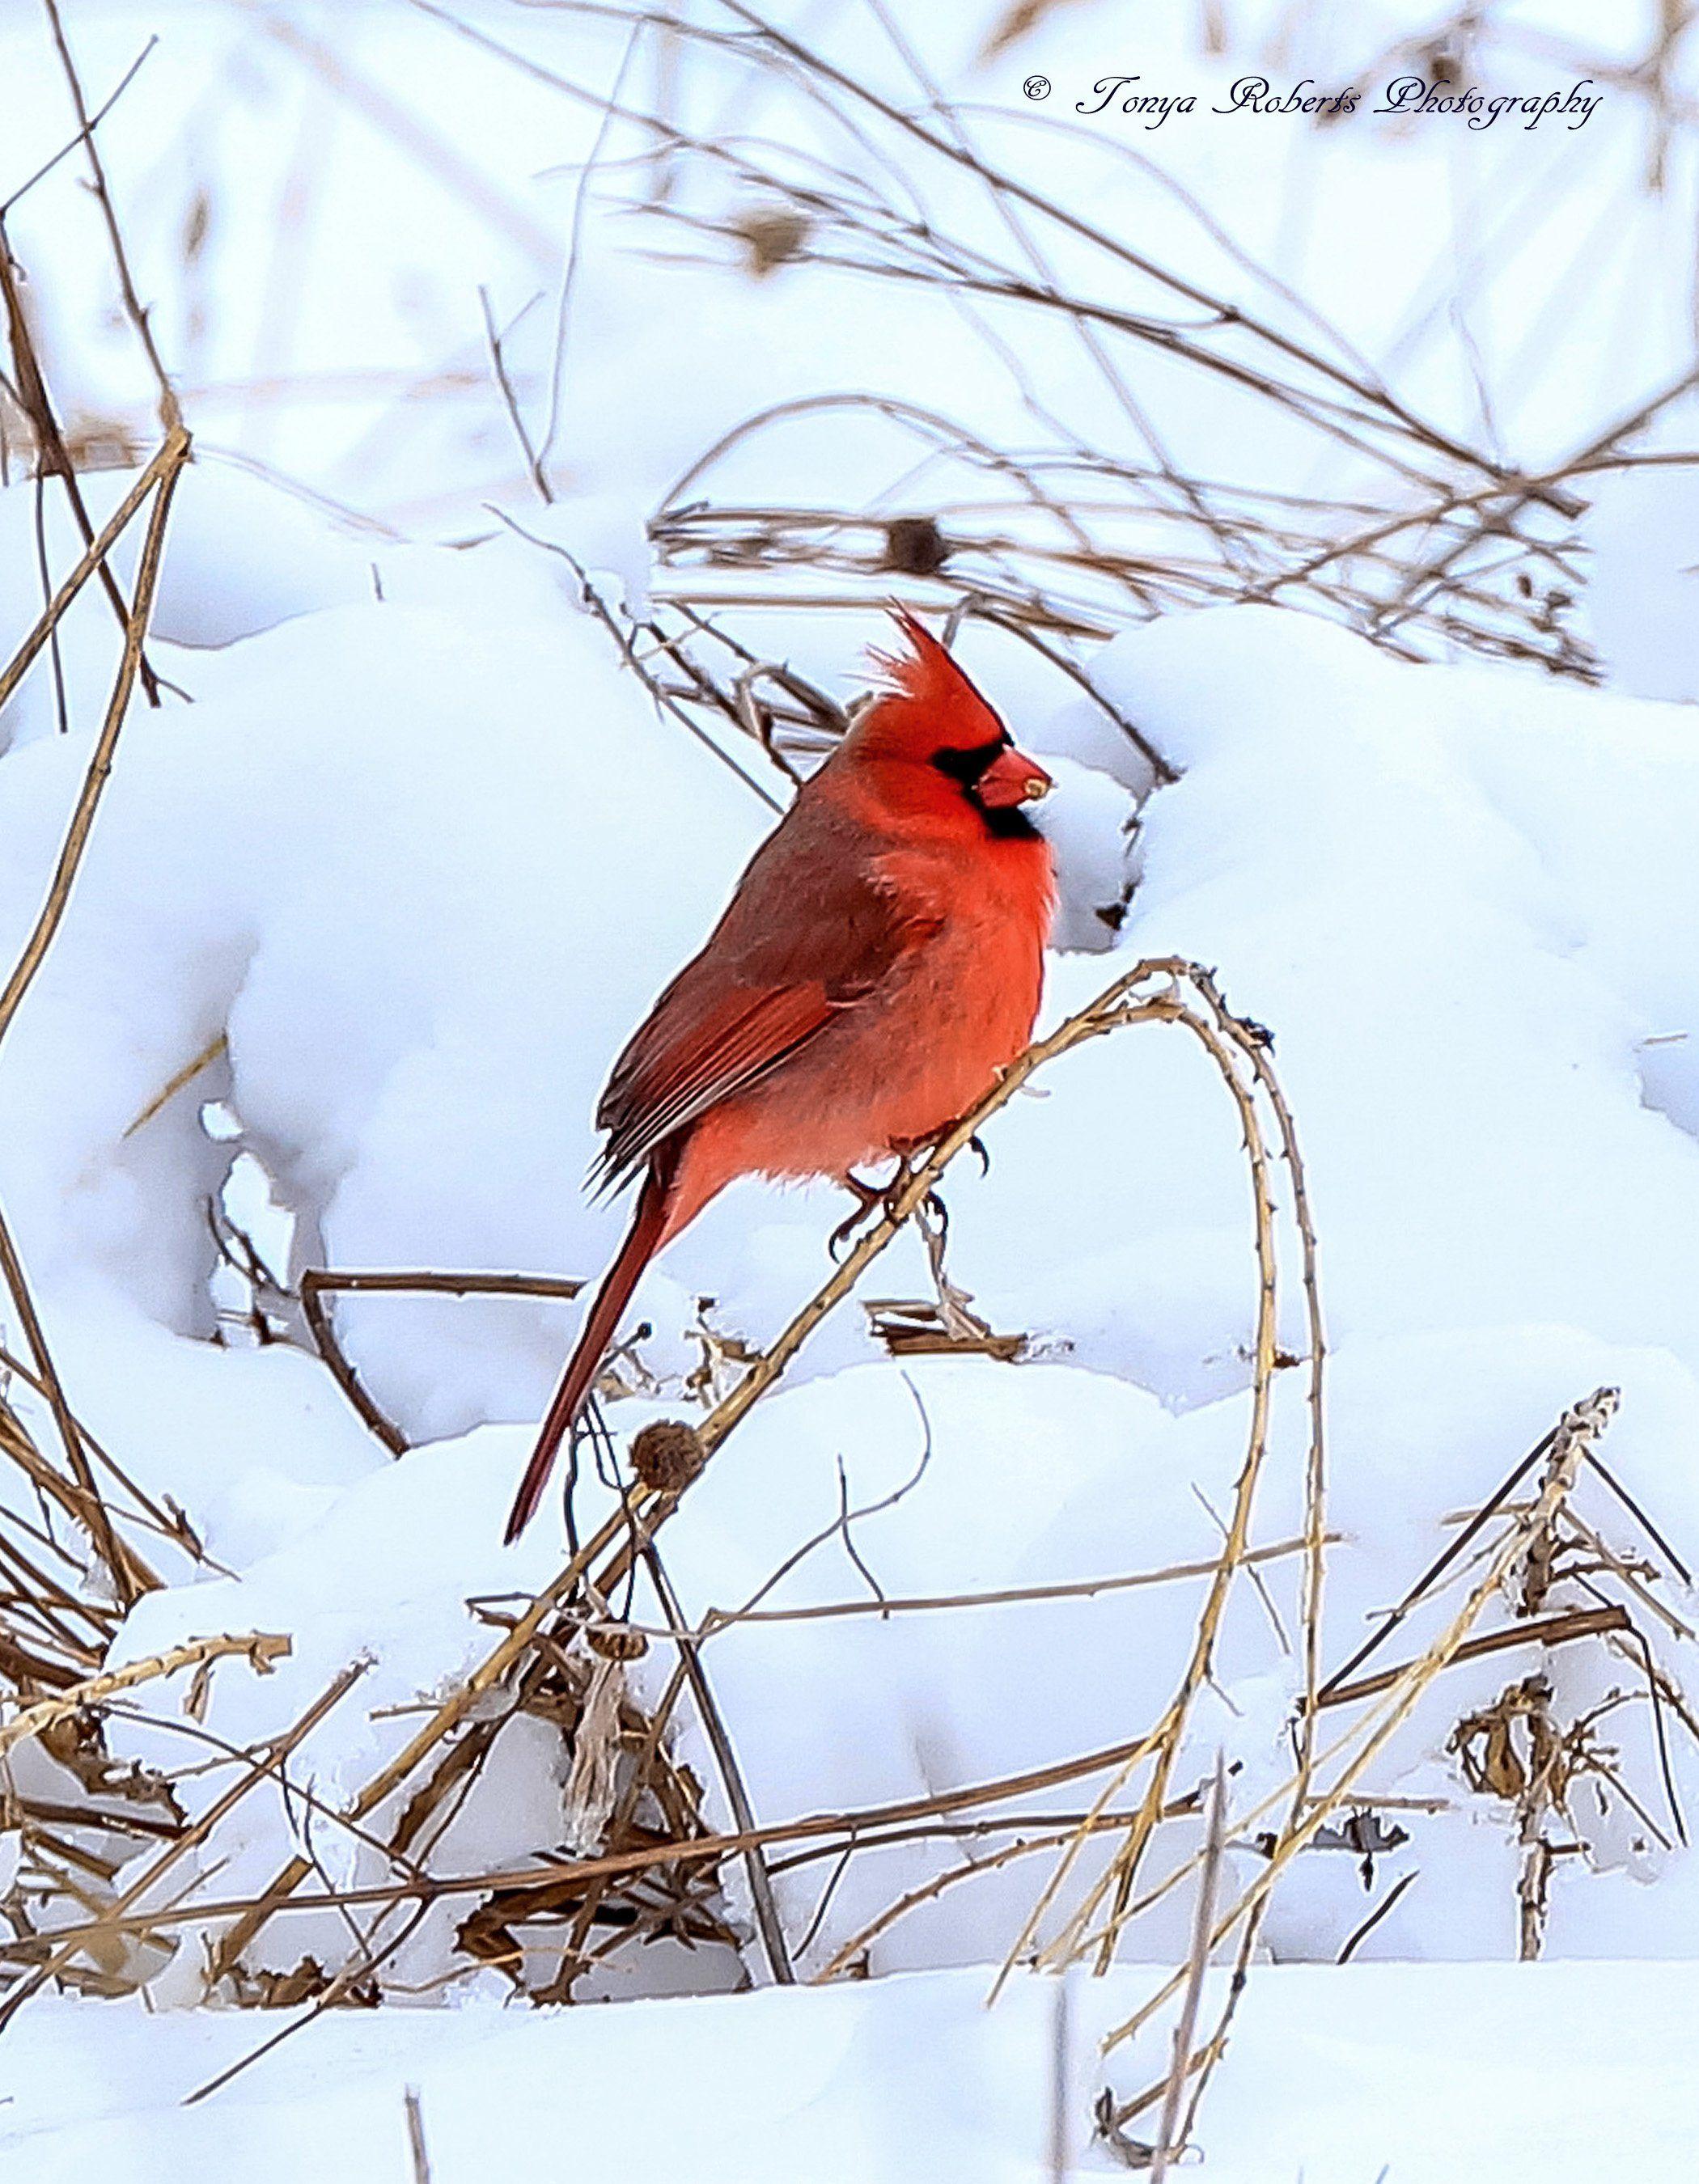 Wildlife photography via Photography Talk.